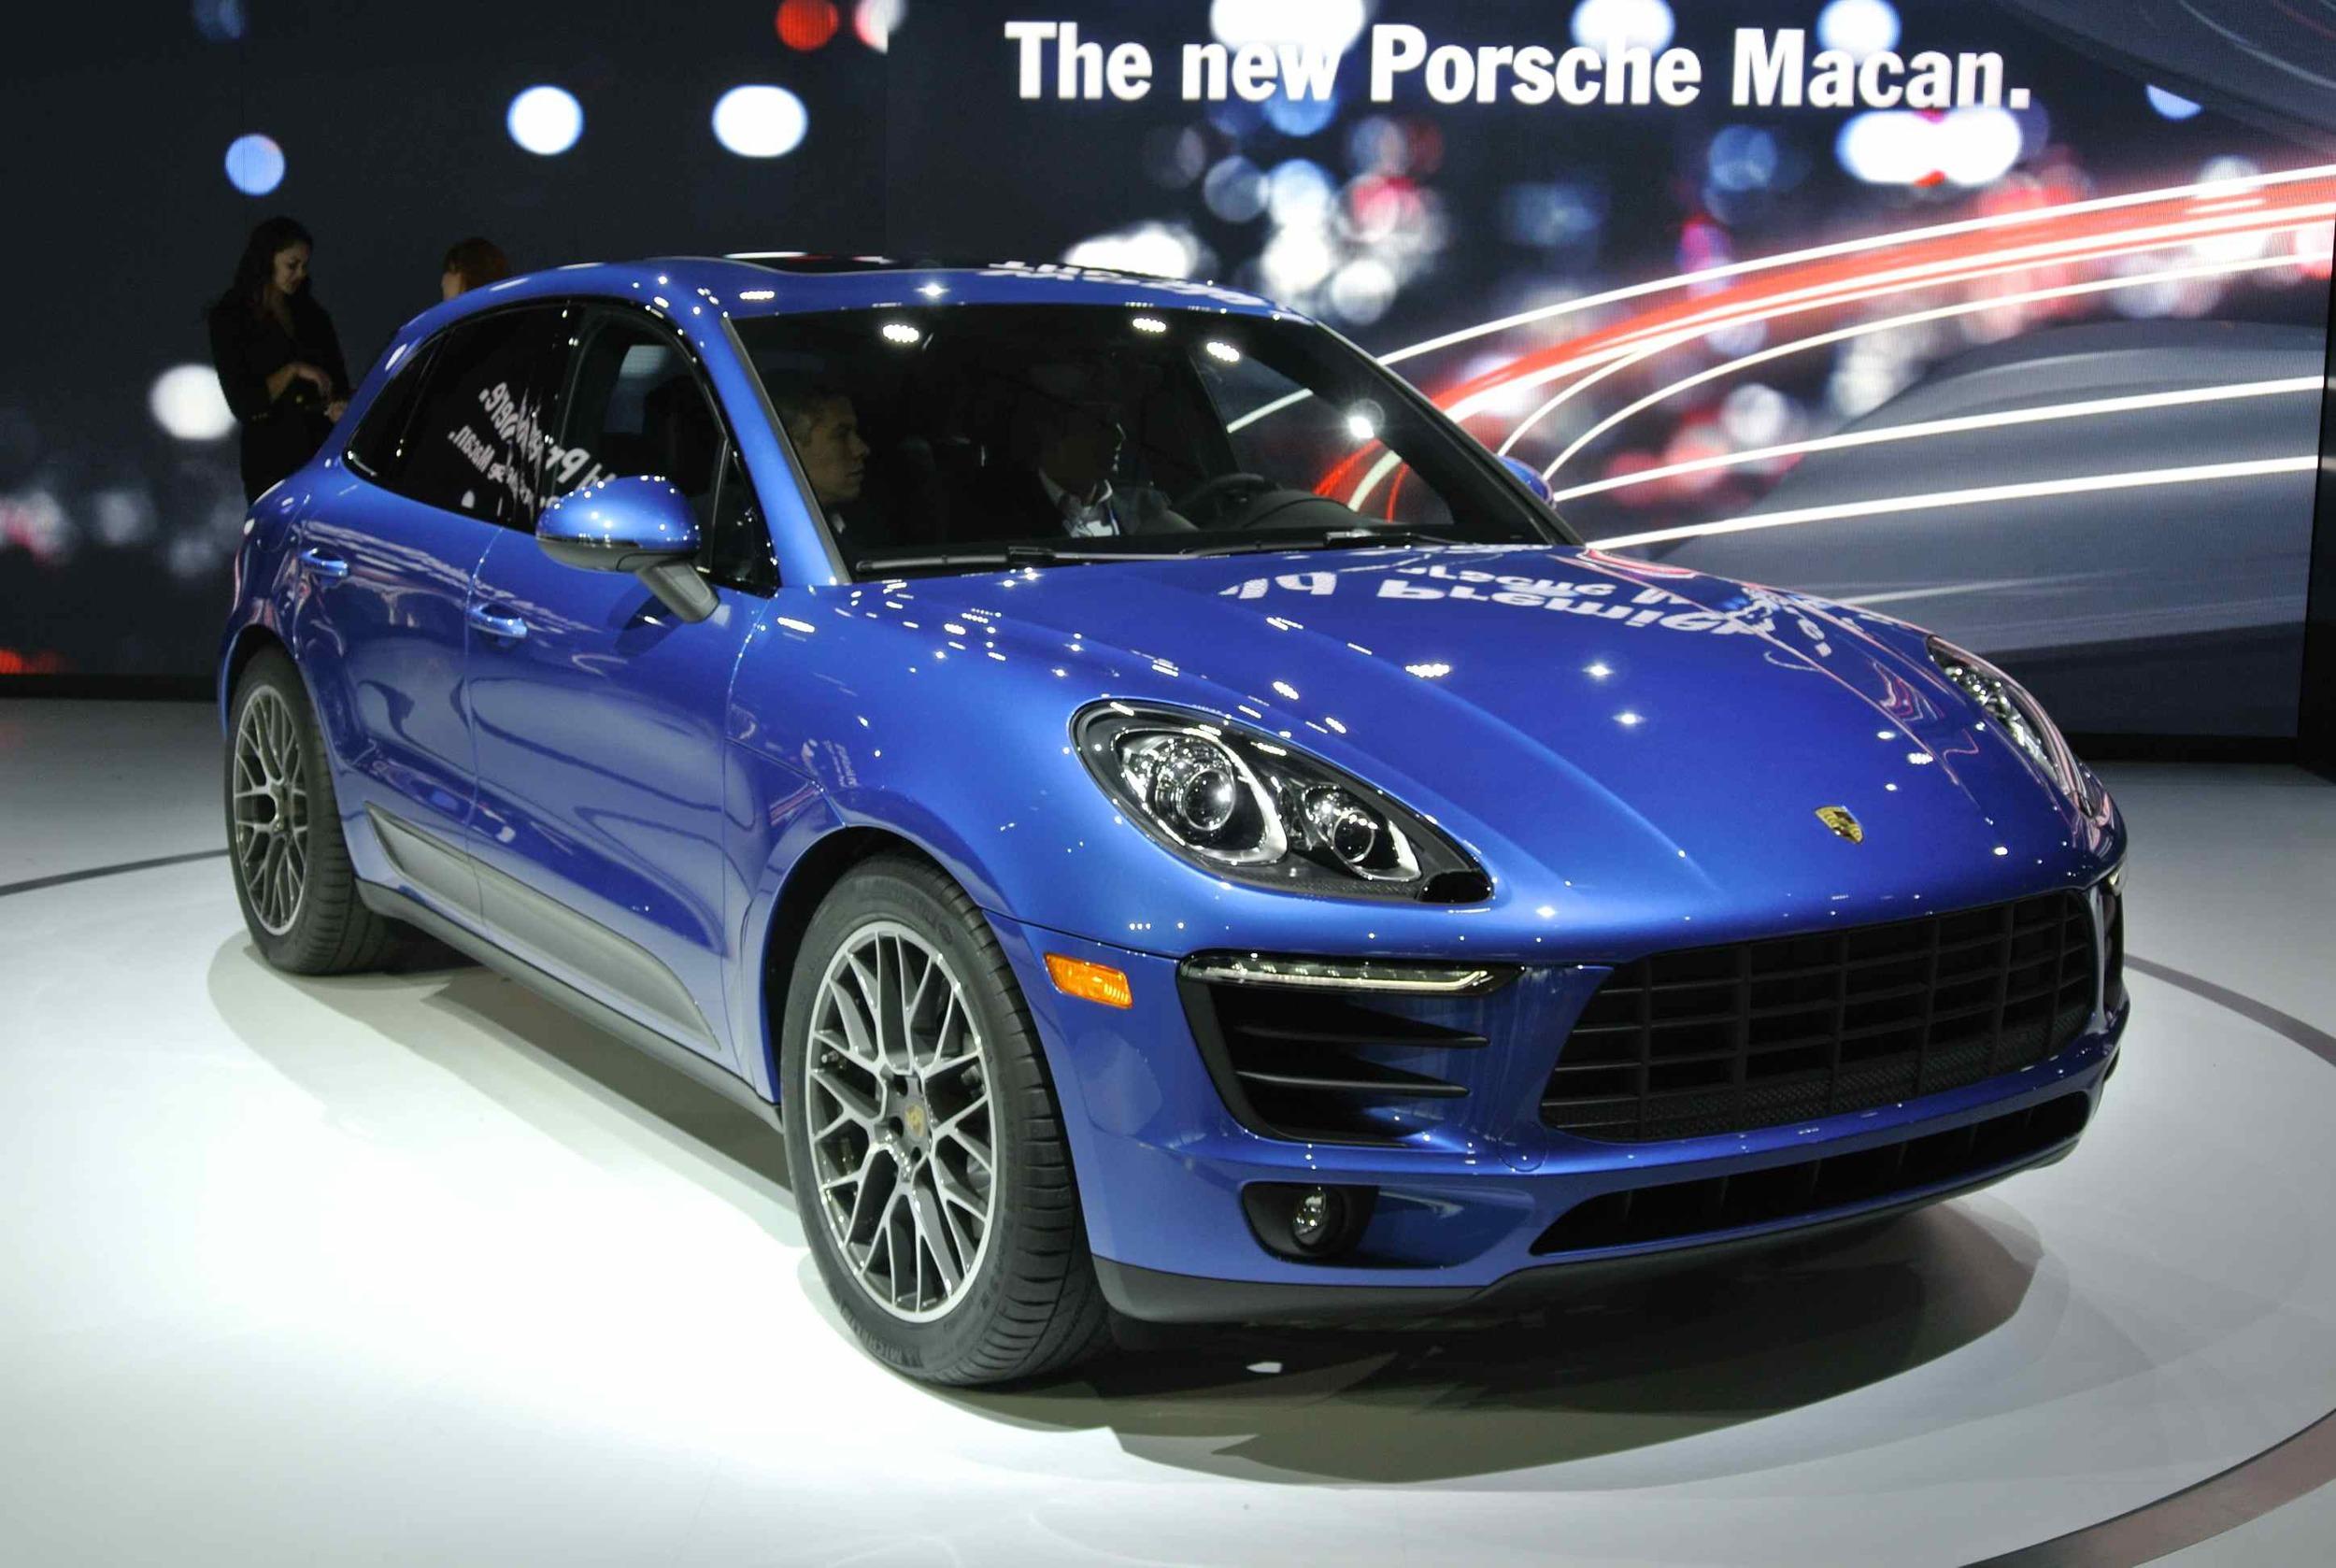 PorscheMacanFront34V21.jpg